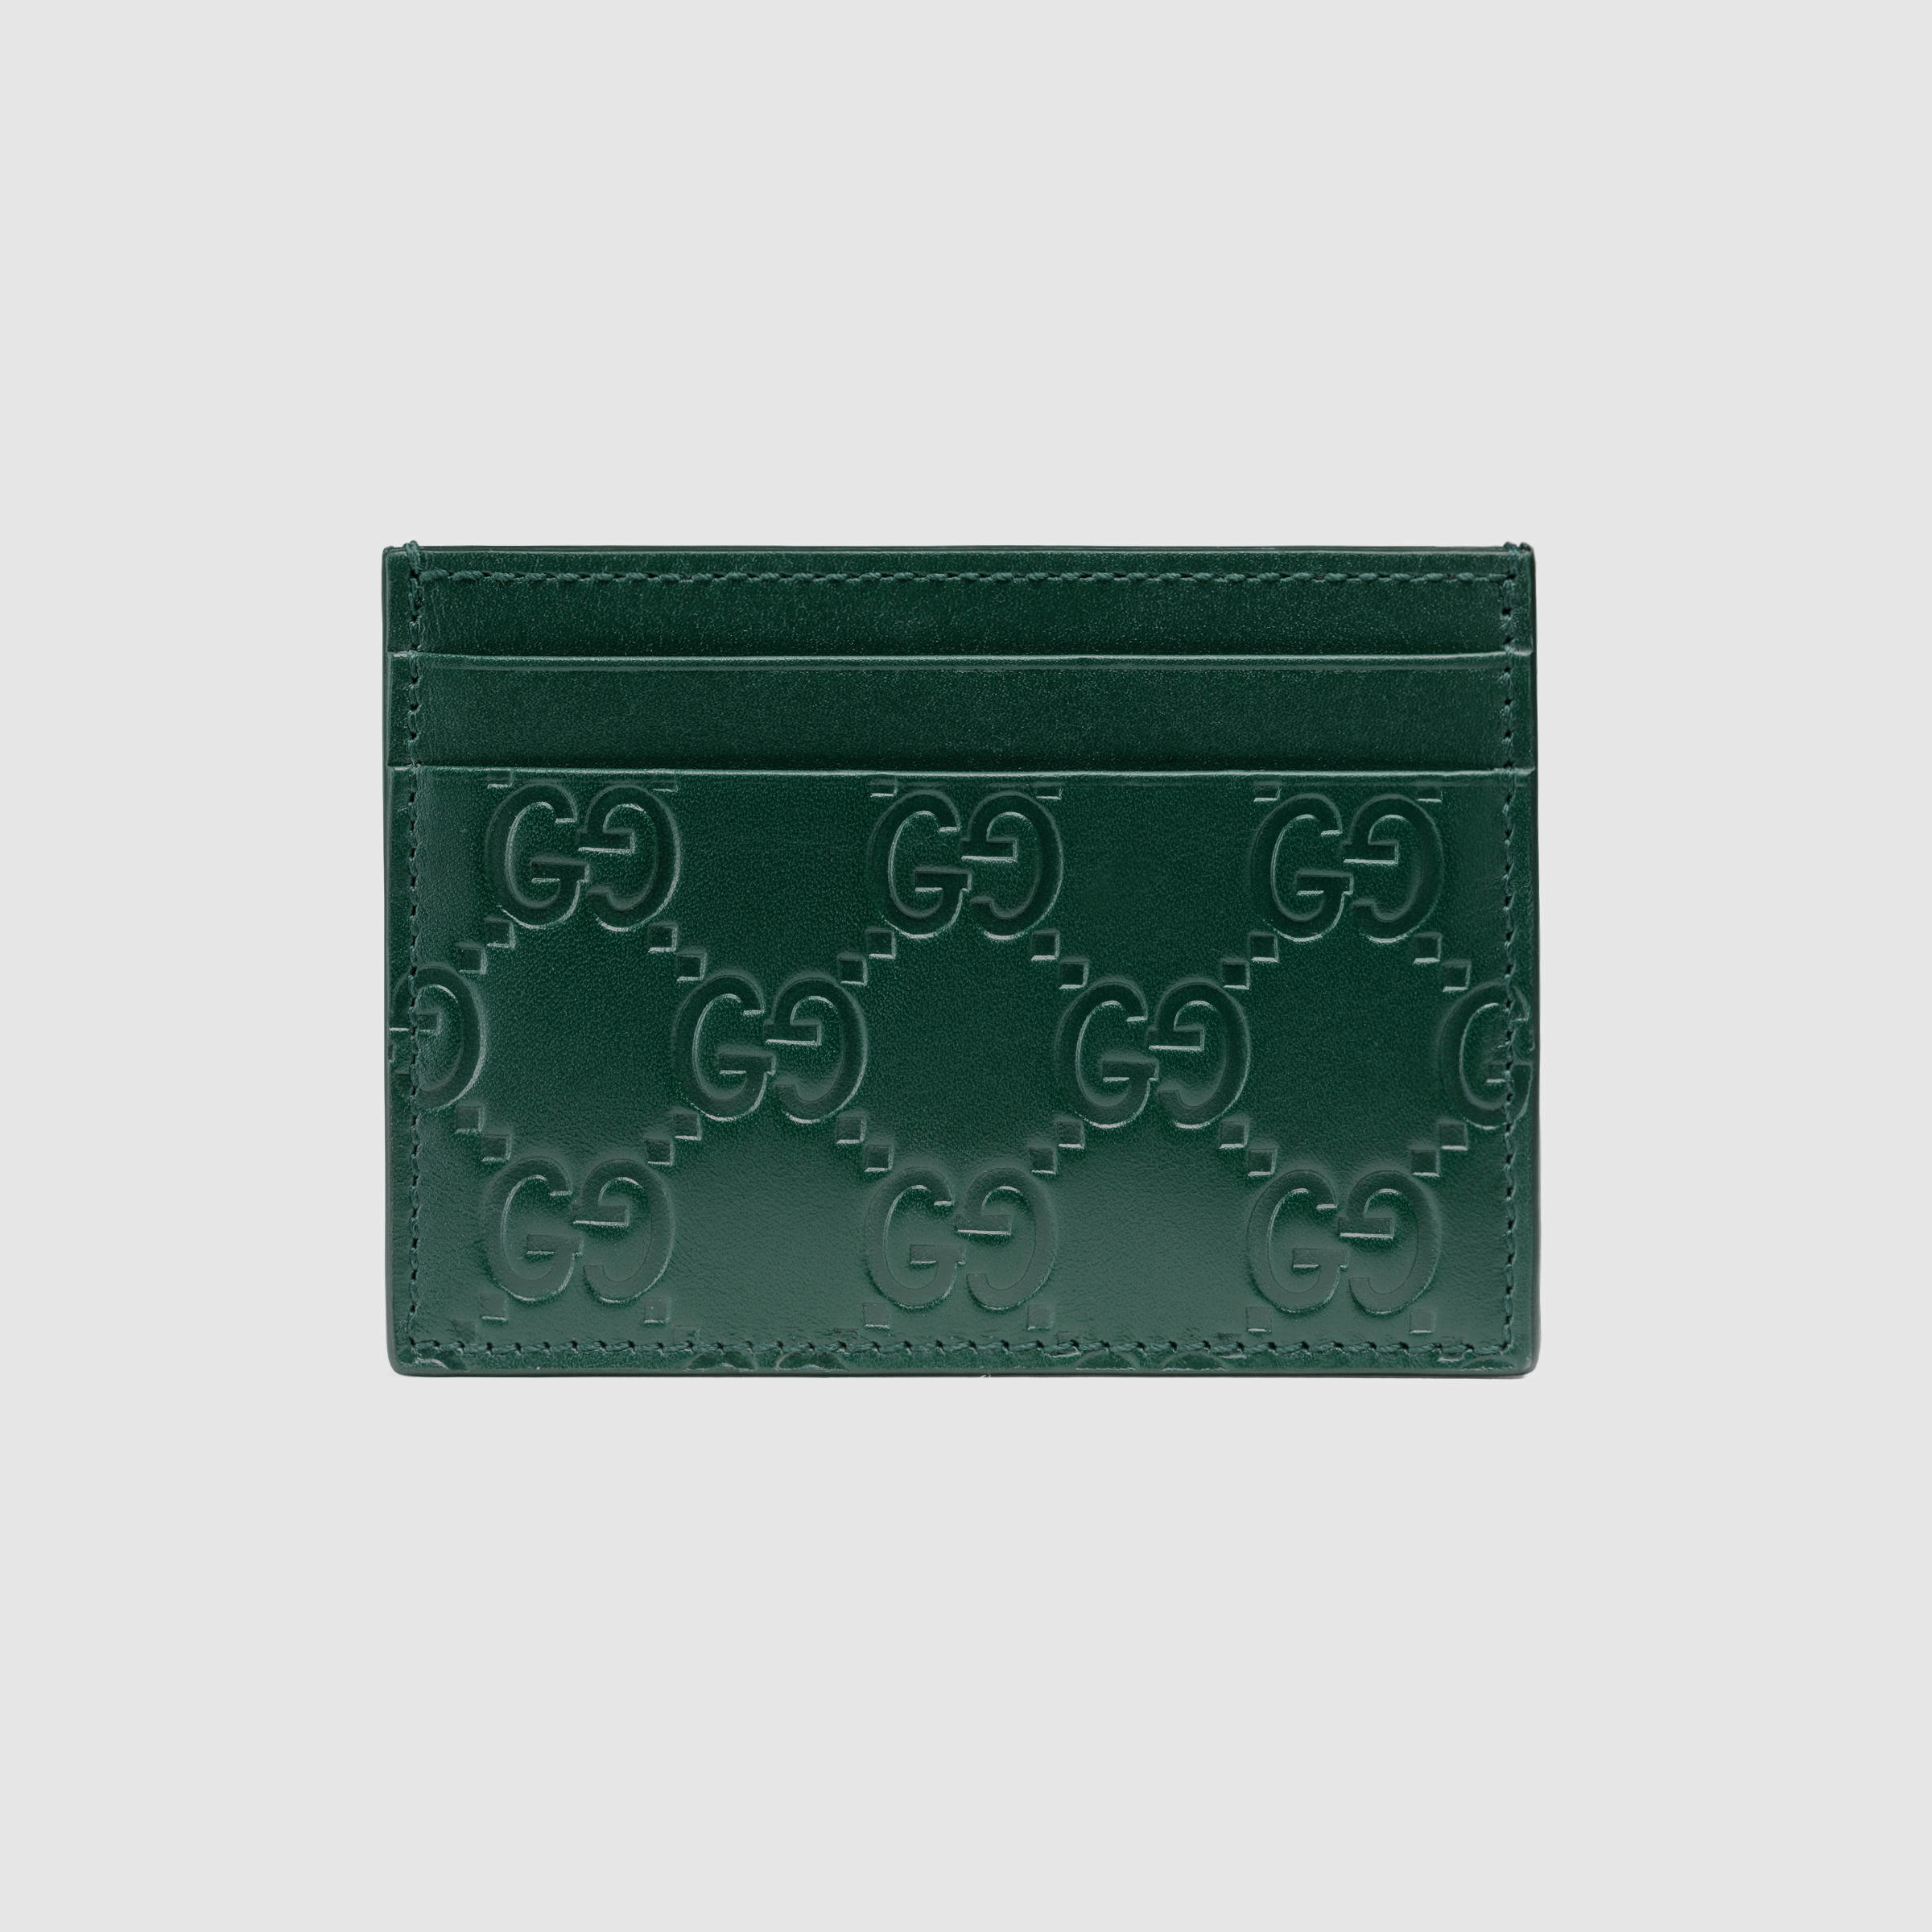 892488b11dbb Lyst - Gucci Signature Card Case in Green